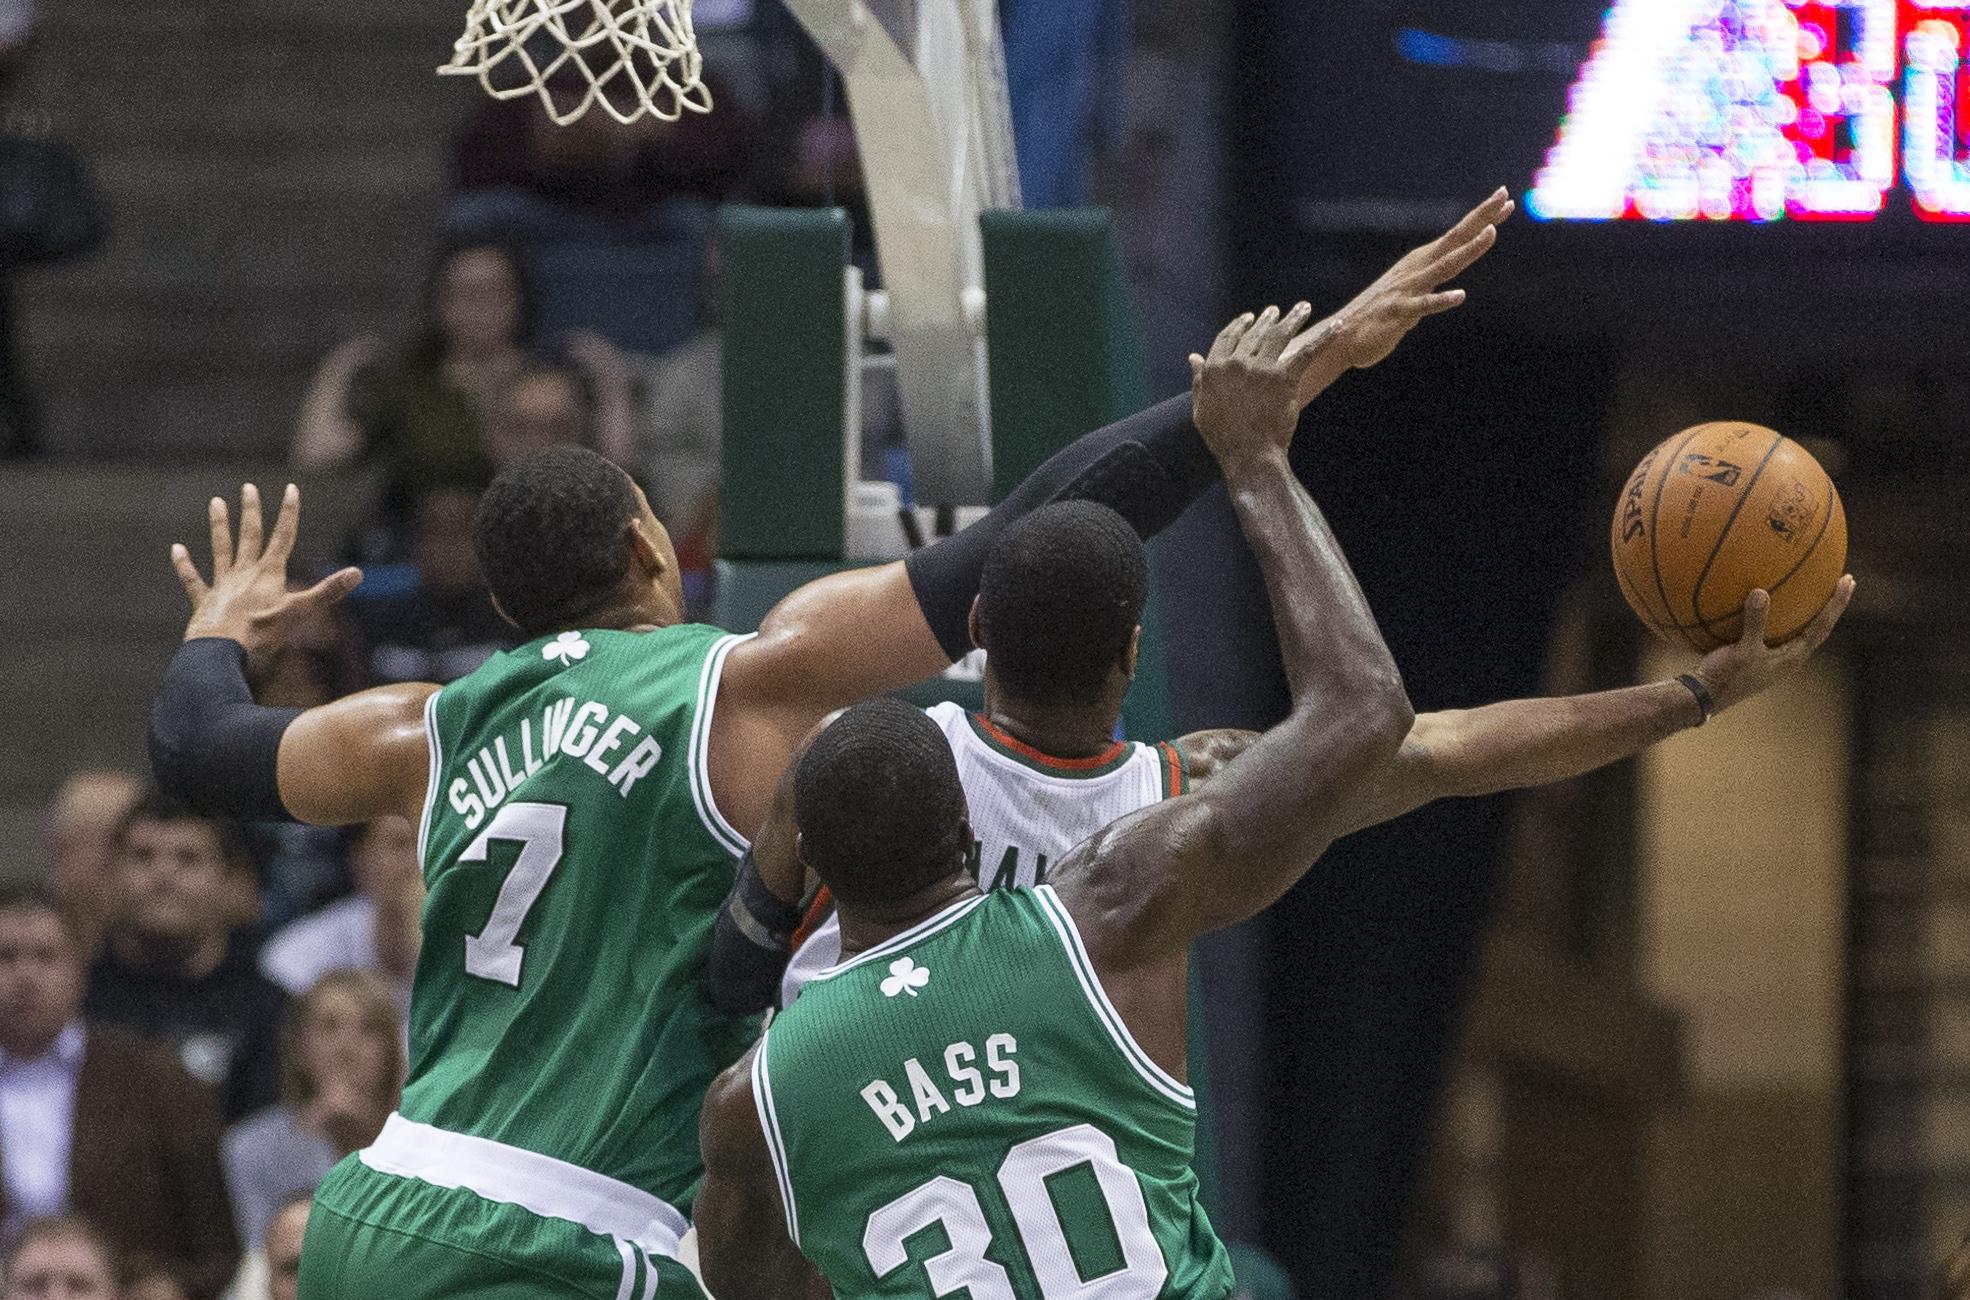 Bucks beat Celtics 92-85 to end 11-game skid